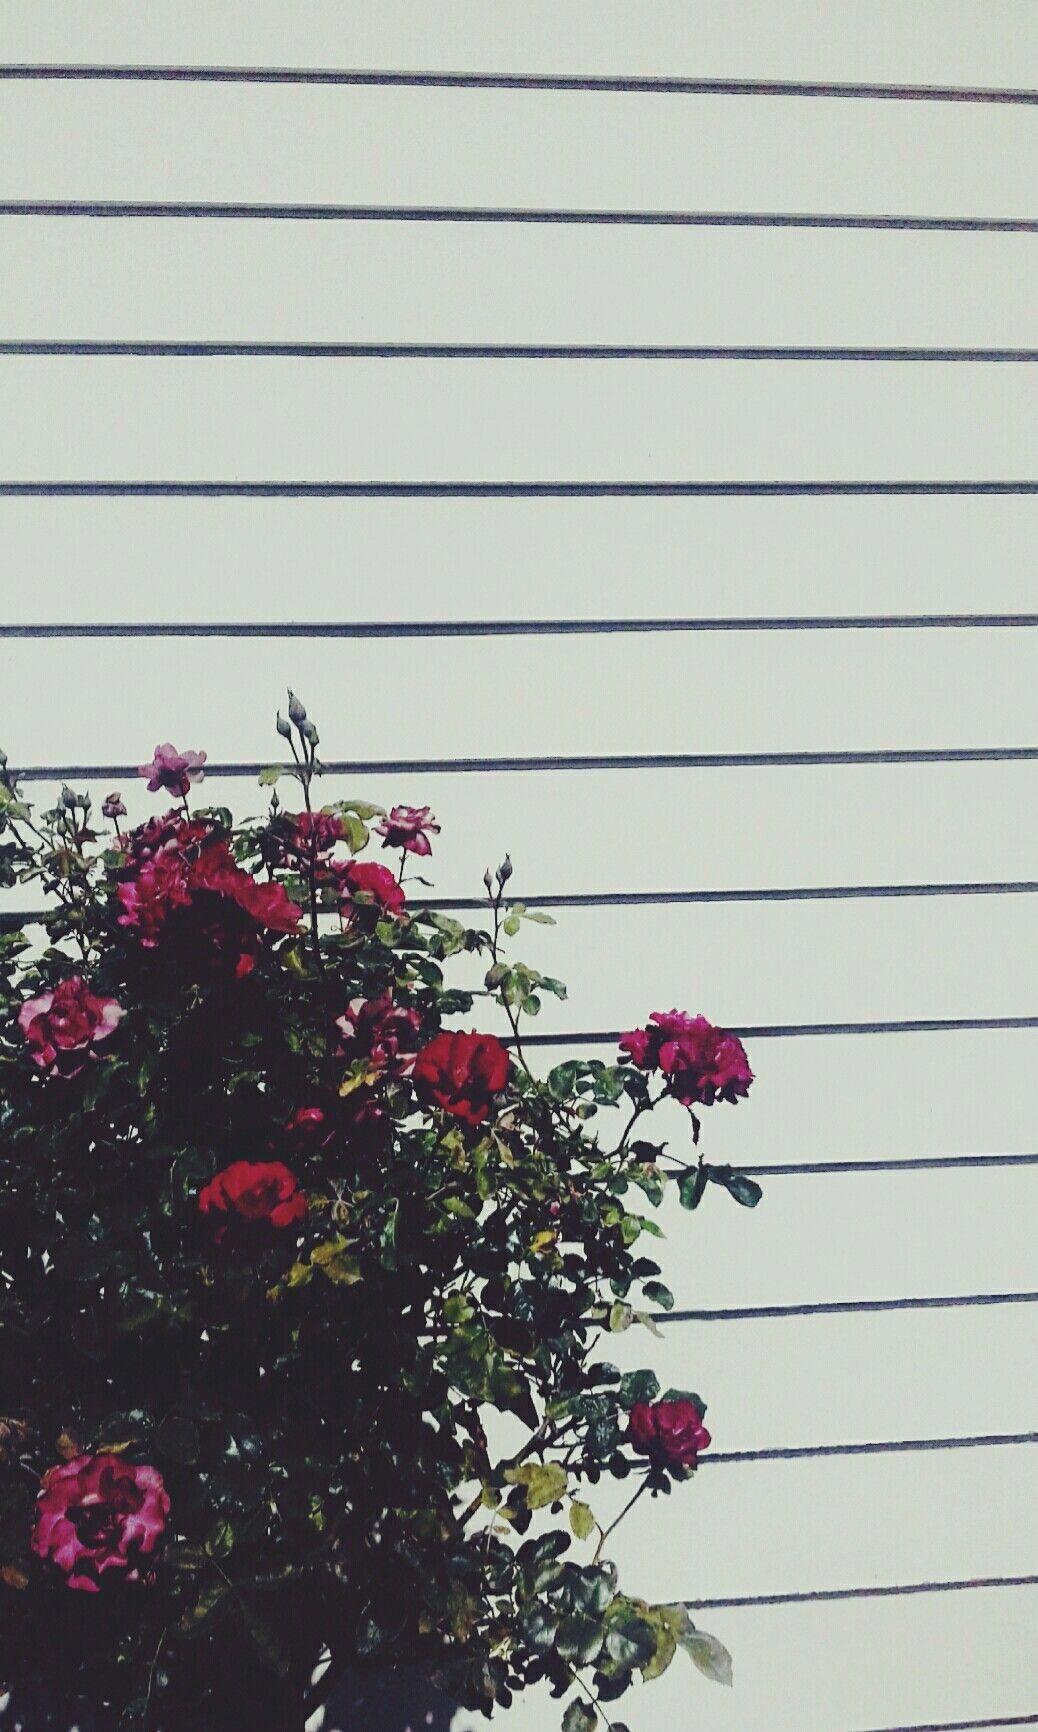 Grunge Tumblr Aesthetic : grunge, tumblr, aesthetic, Grunge, Tumblr, Aesthetic, Flower, Wallpapers, Backgrounds, WallpaperAccess